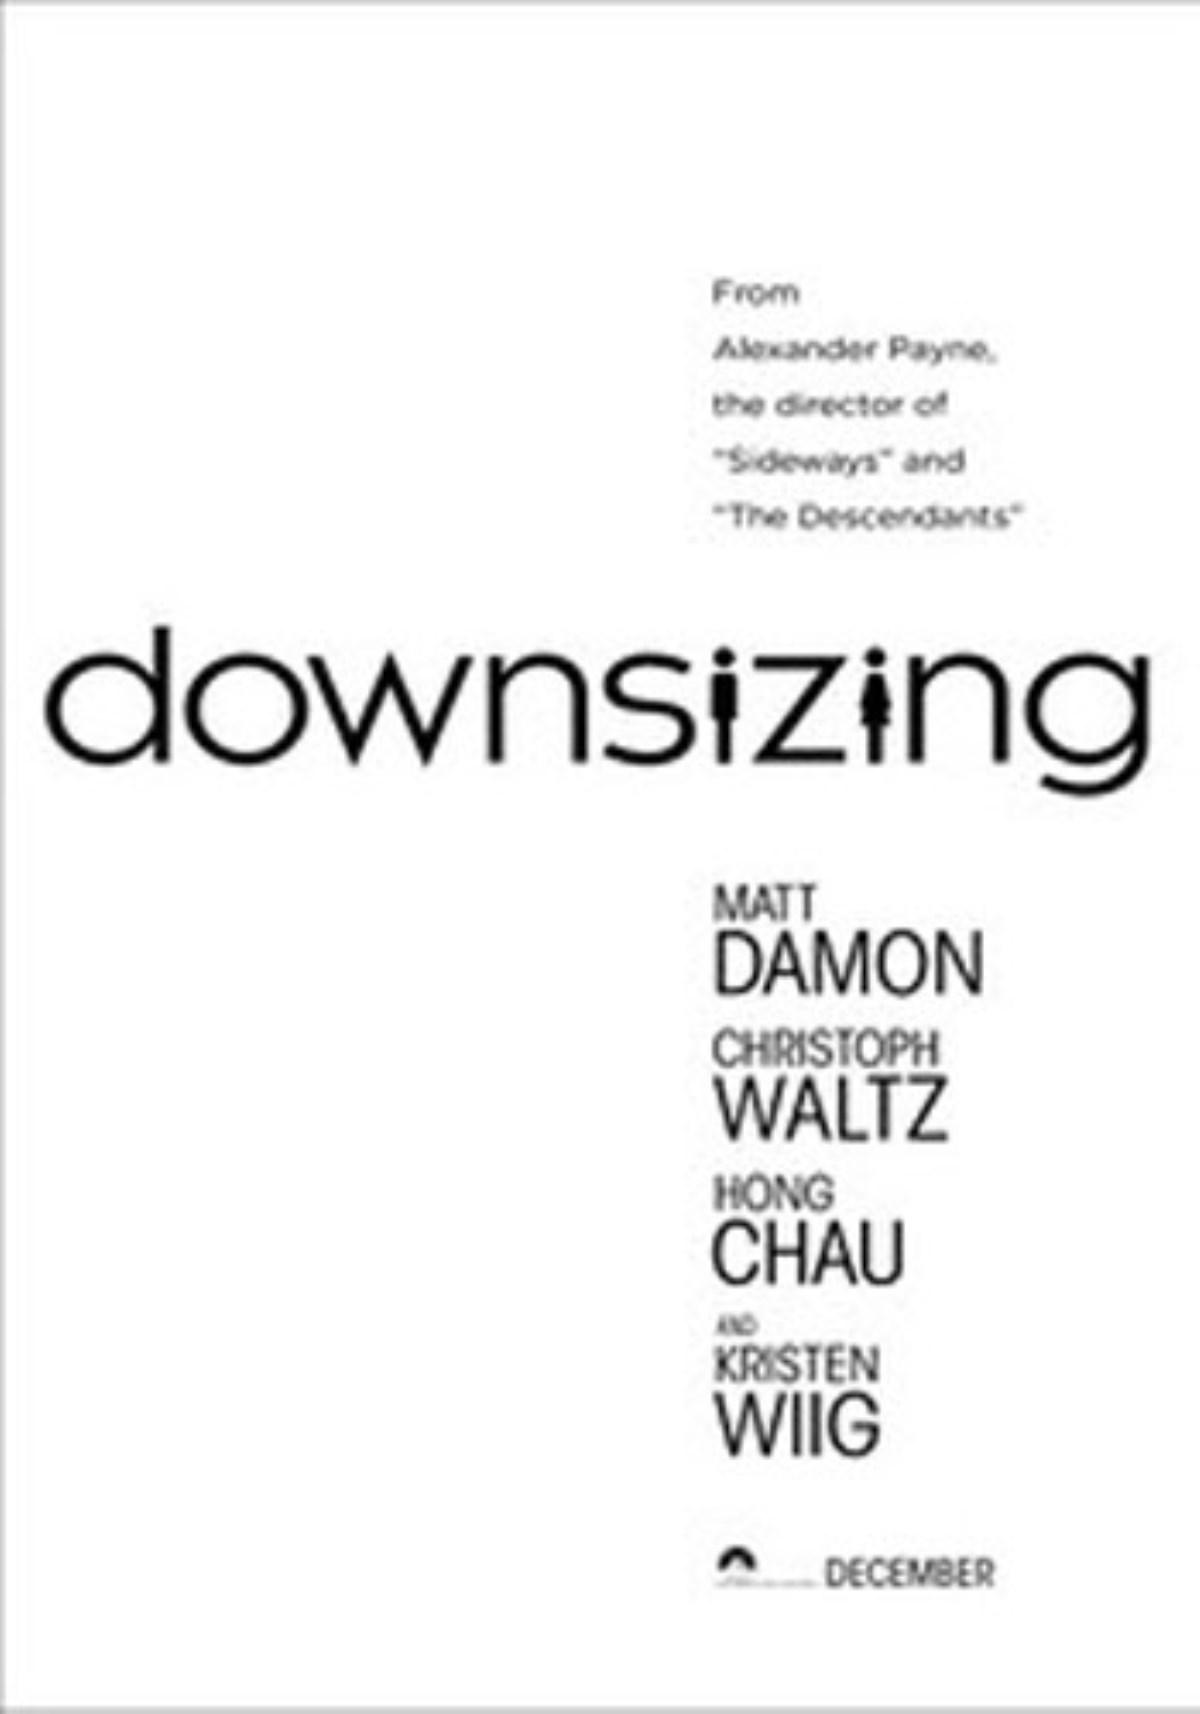 کوچک سازی(Downsizing)